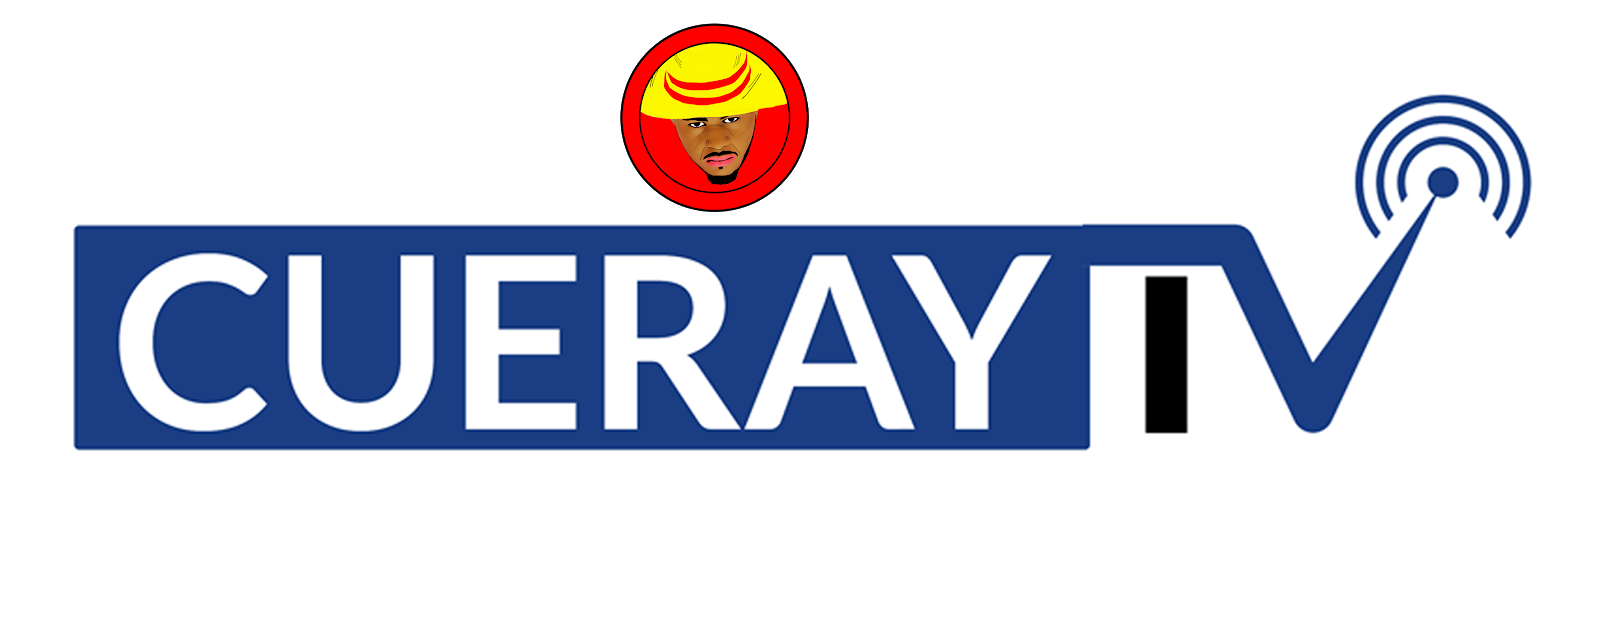 CUERAYTV.COM  || CUERAY TV A HUB FOR NIGERIAN COMEDY SKITS, MOVIES N MORE